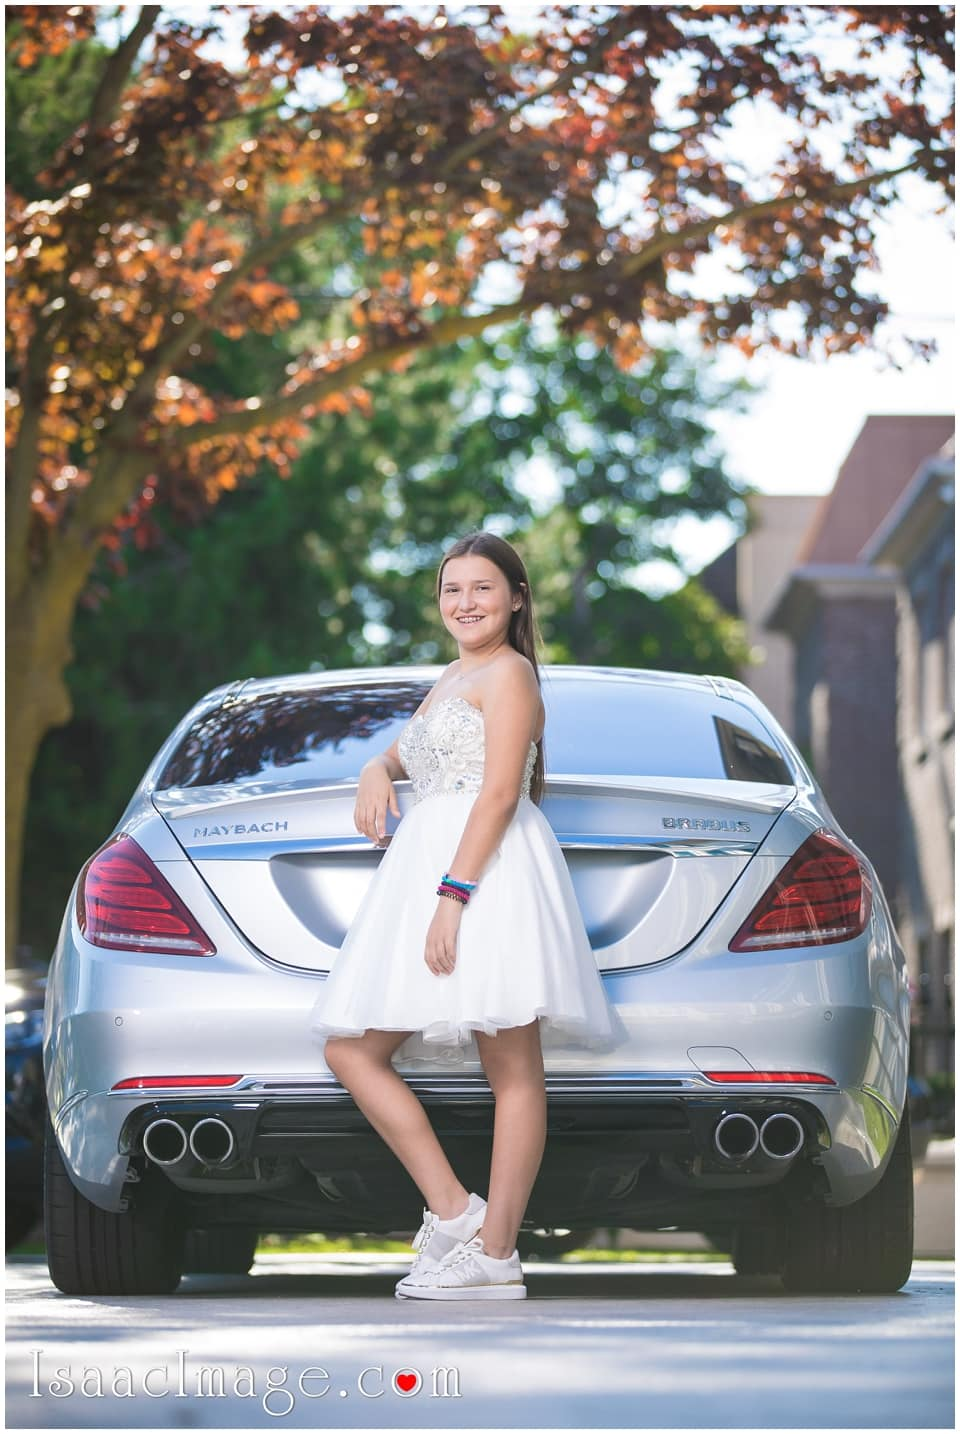 Toronto Rolls Royce Wraith and Mercedes Maybach Brabus photo session 26.jpg